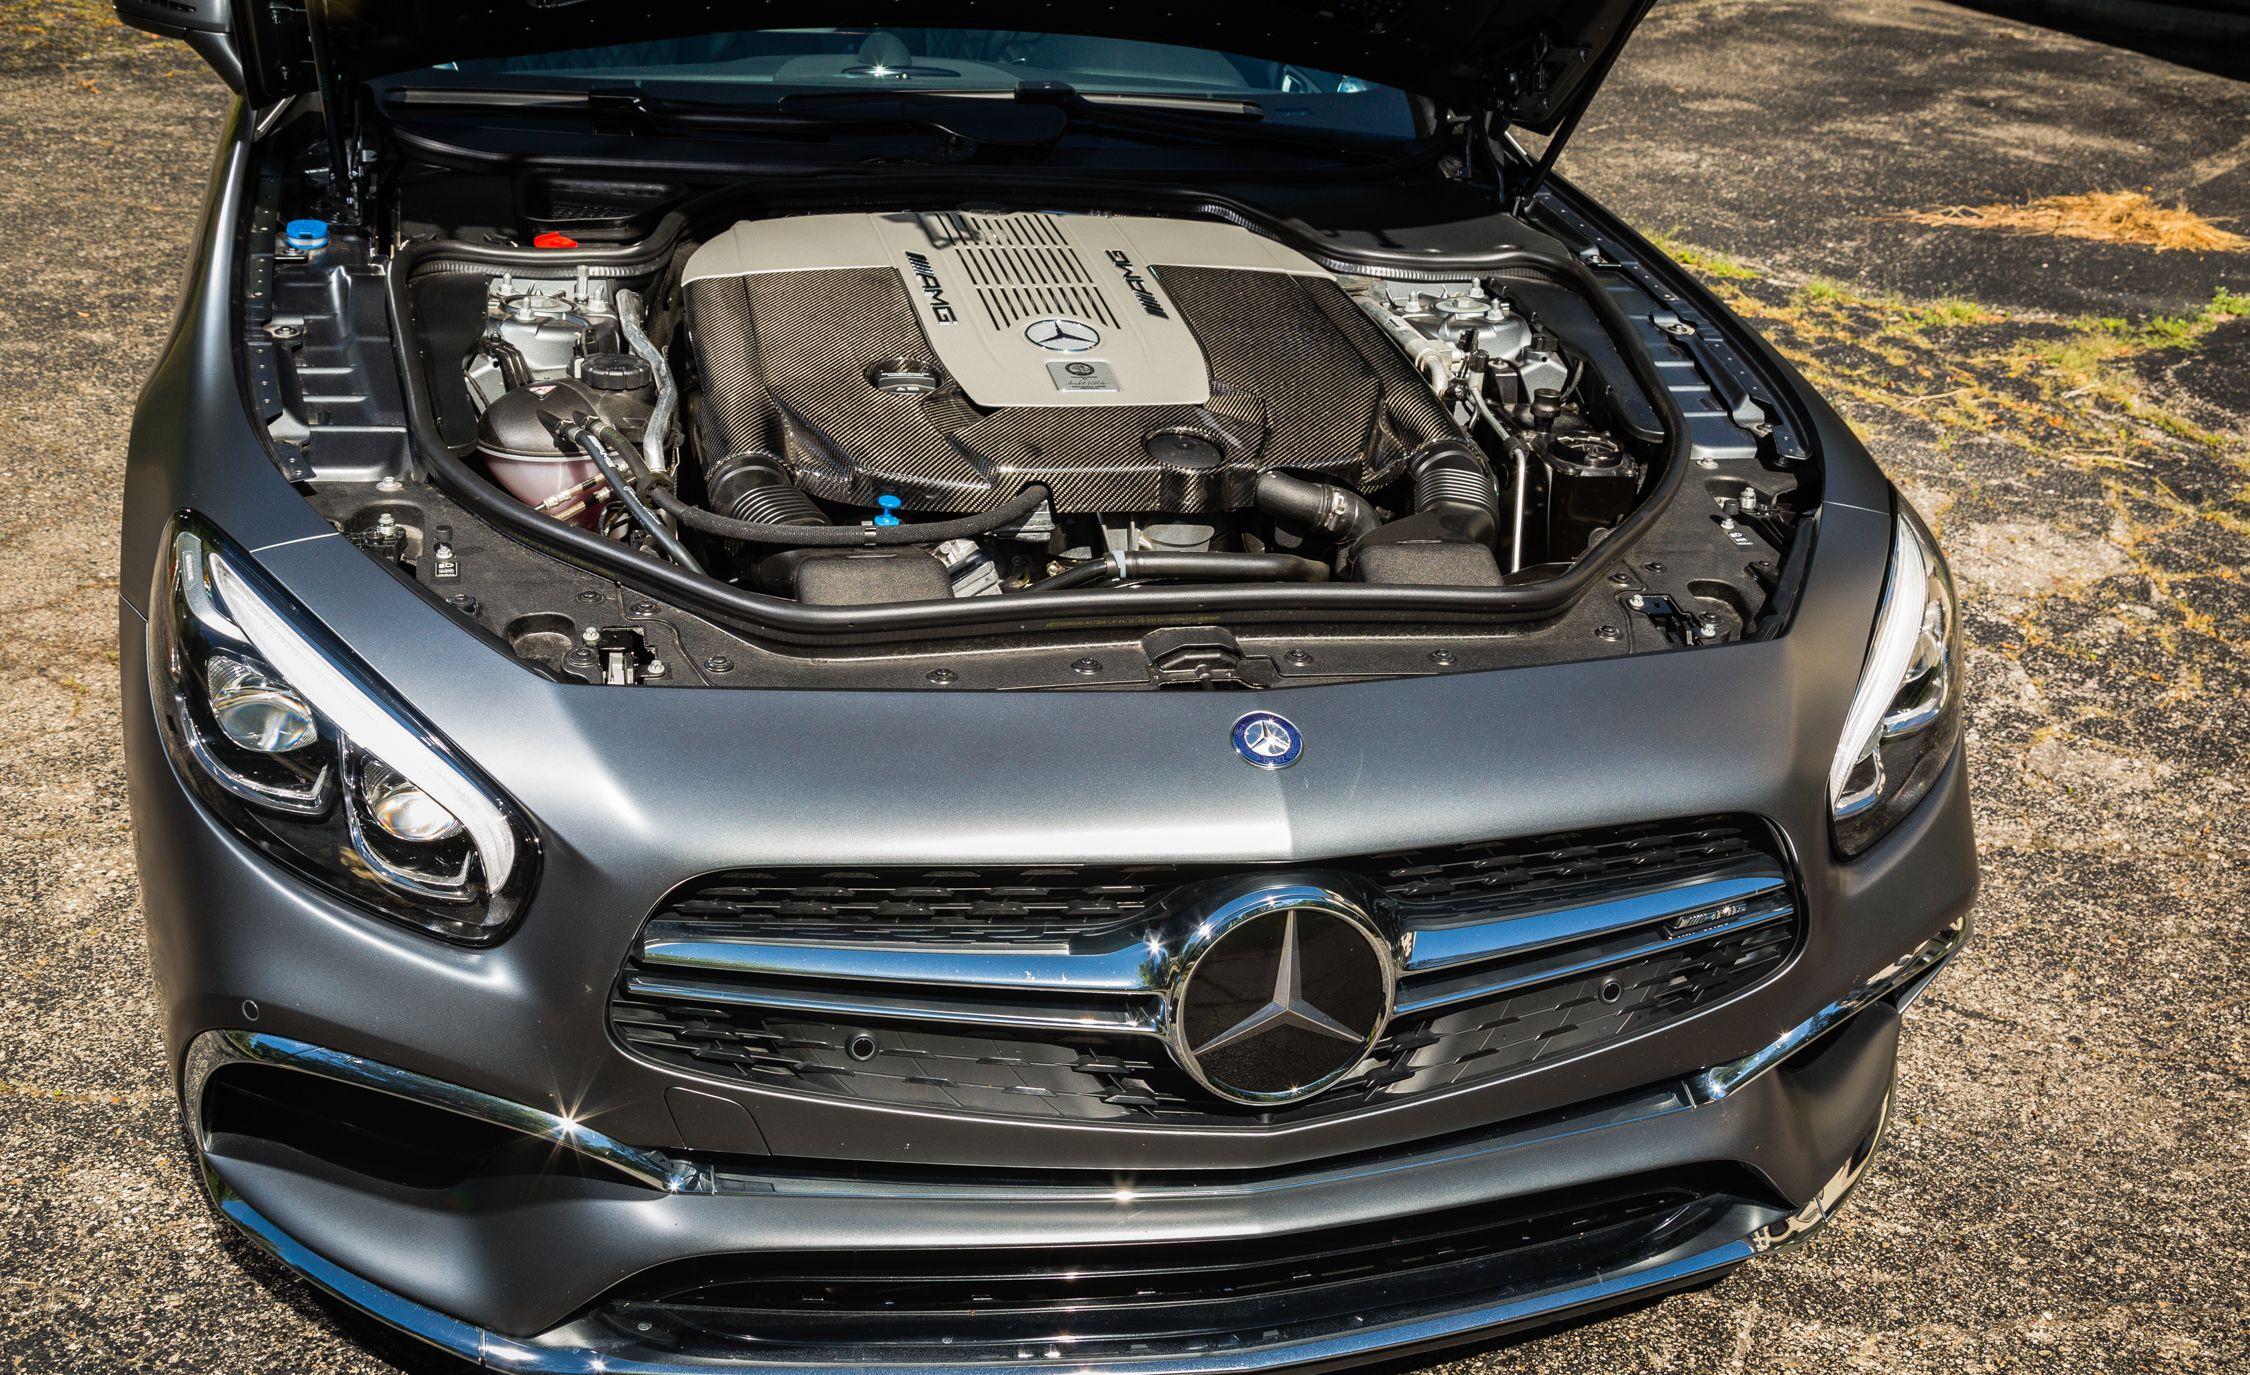 https://hips.hearstapps.com/amv-prod-cad-assets.s3.amazonaws.com/wp-content/uploads/2016/08/2017-Mercedes-AMG-SL65-142.jpg